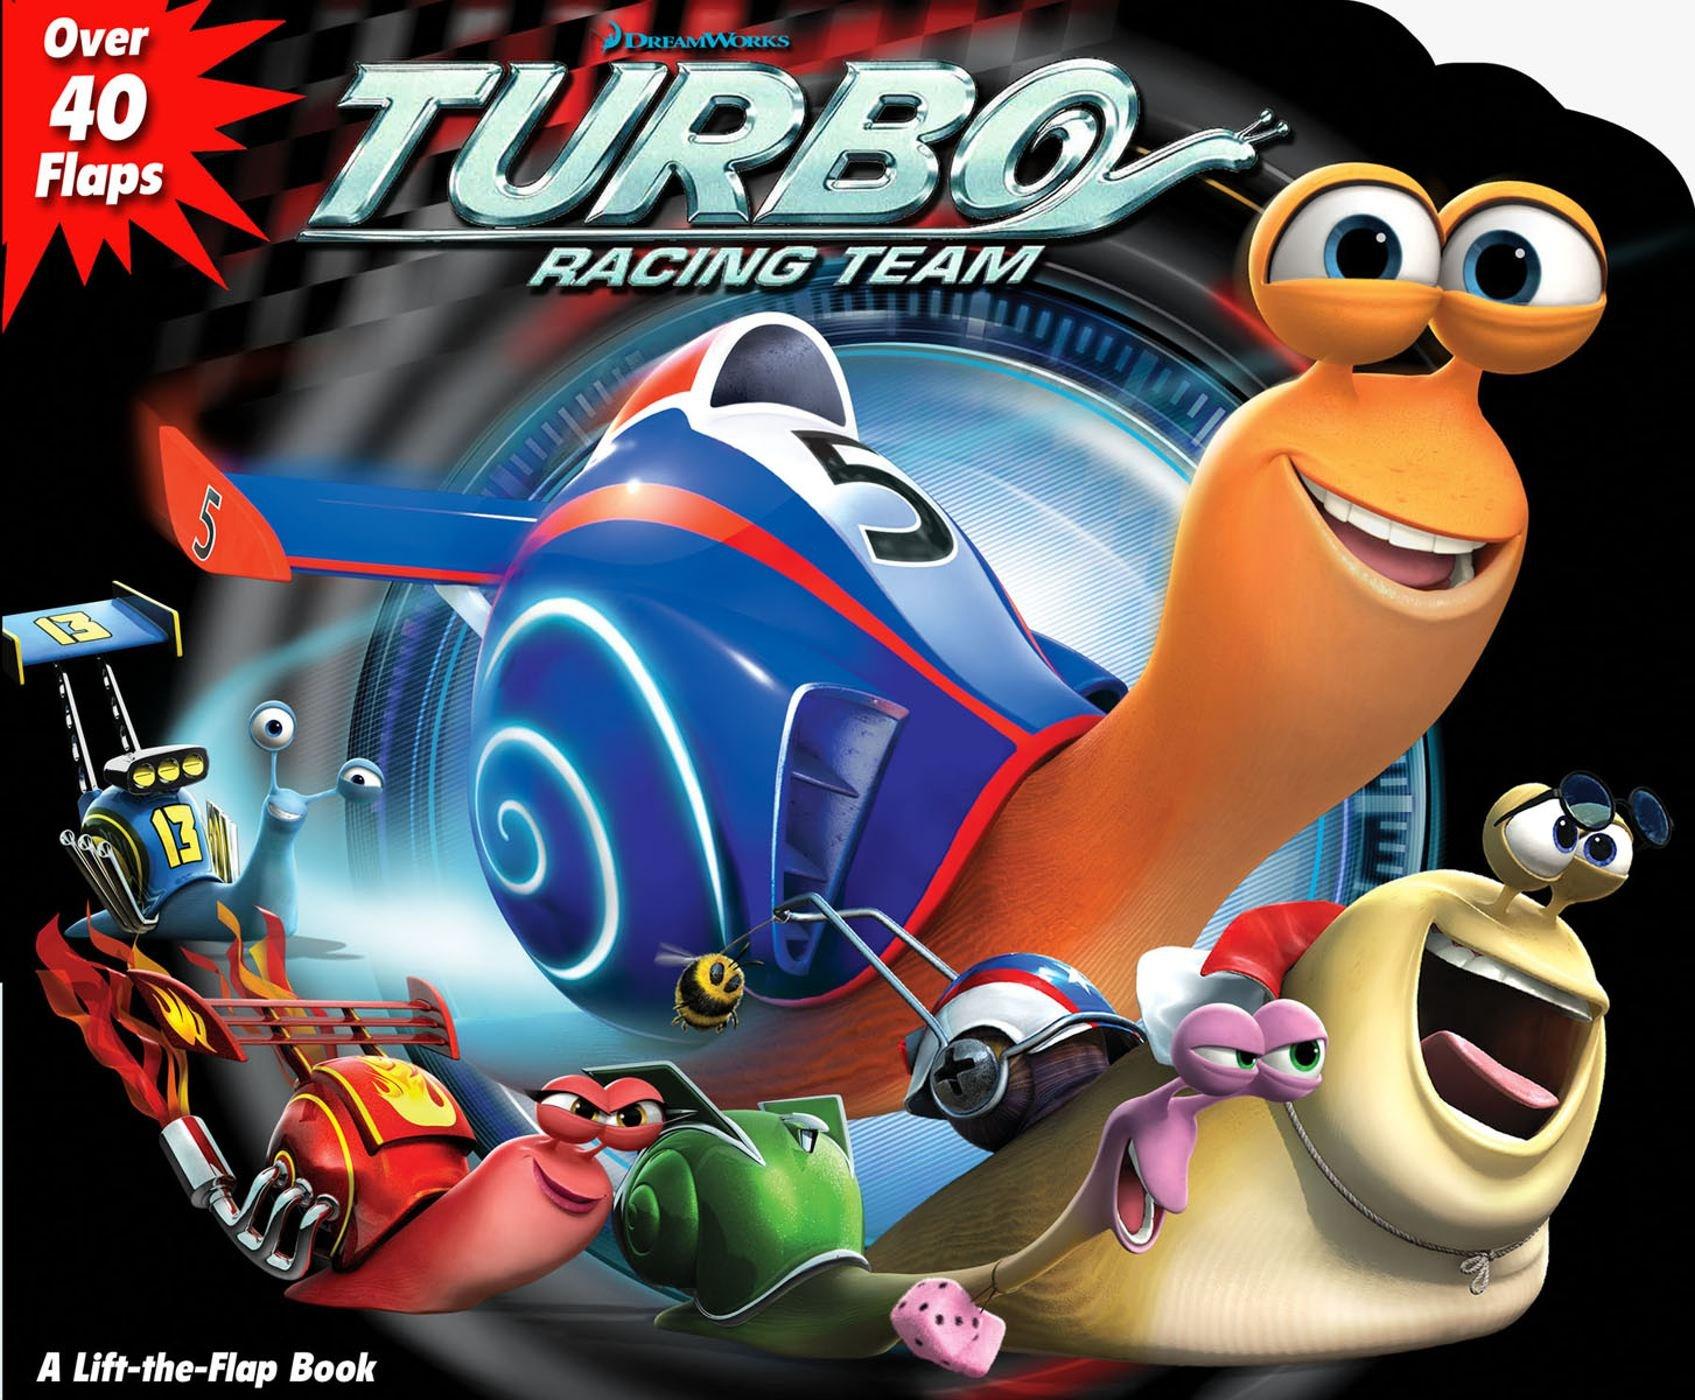 Turbo Racing Team: Amazon.es: Cynthia Stierle, Tina Francisco, Katrina Mae S. Hao: Libros en idiomas extranjeros